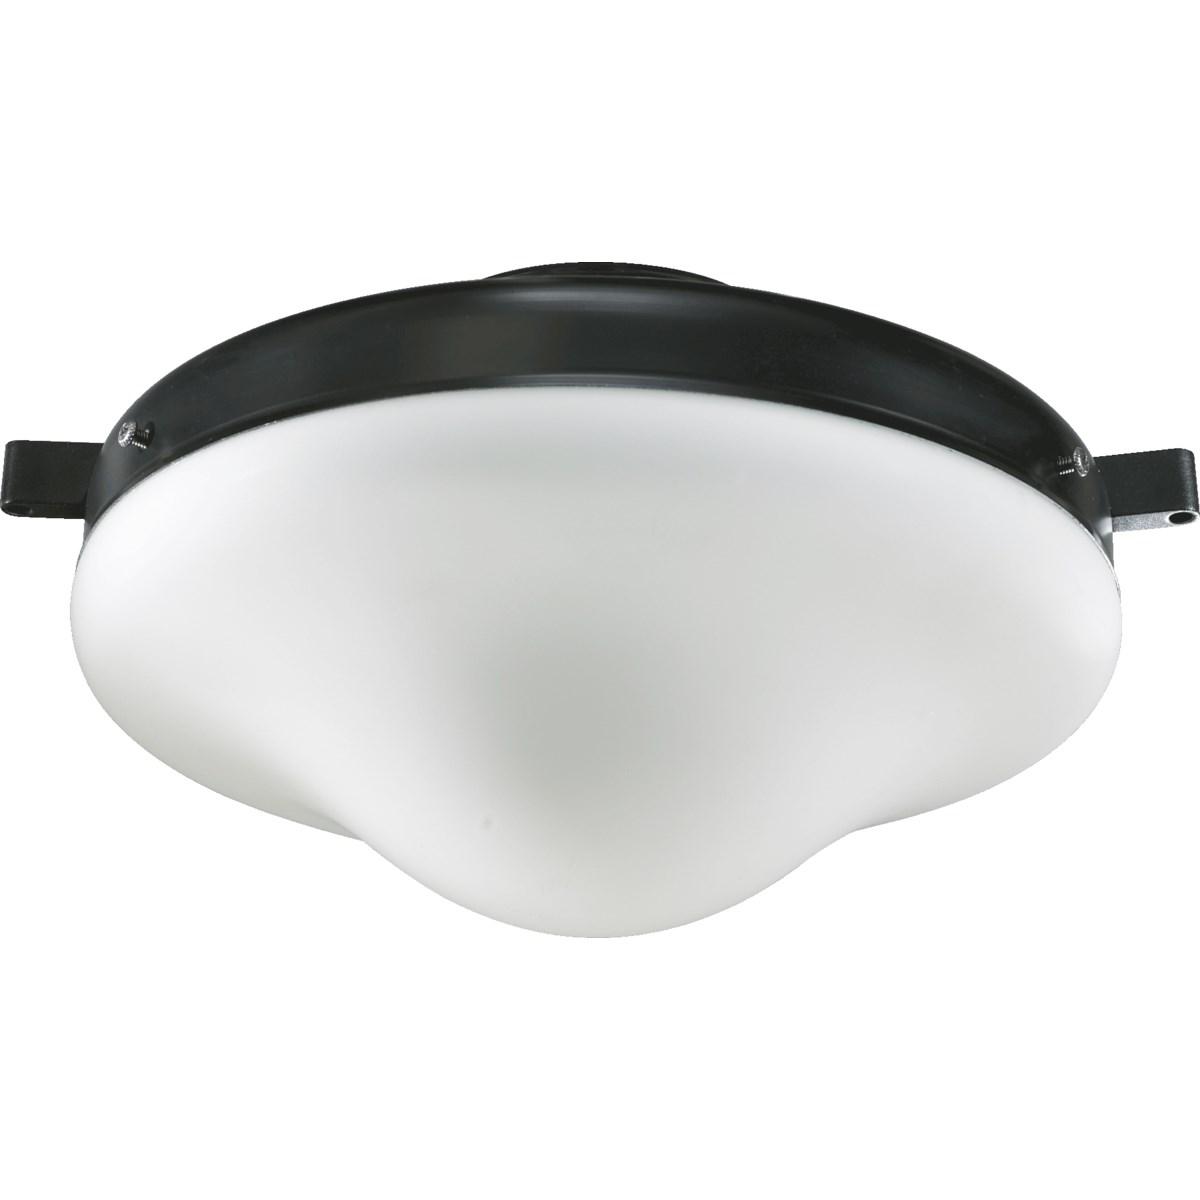 WET LED LK W/ OPAL - OW